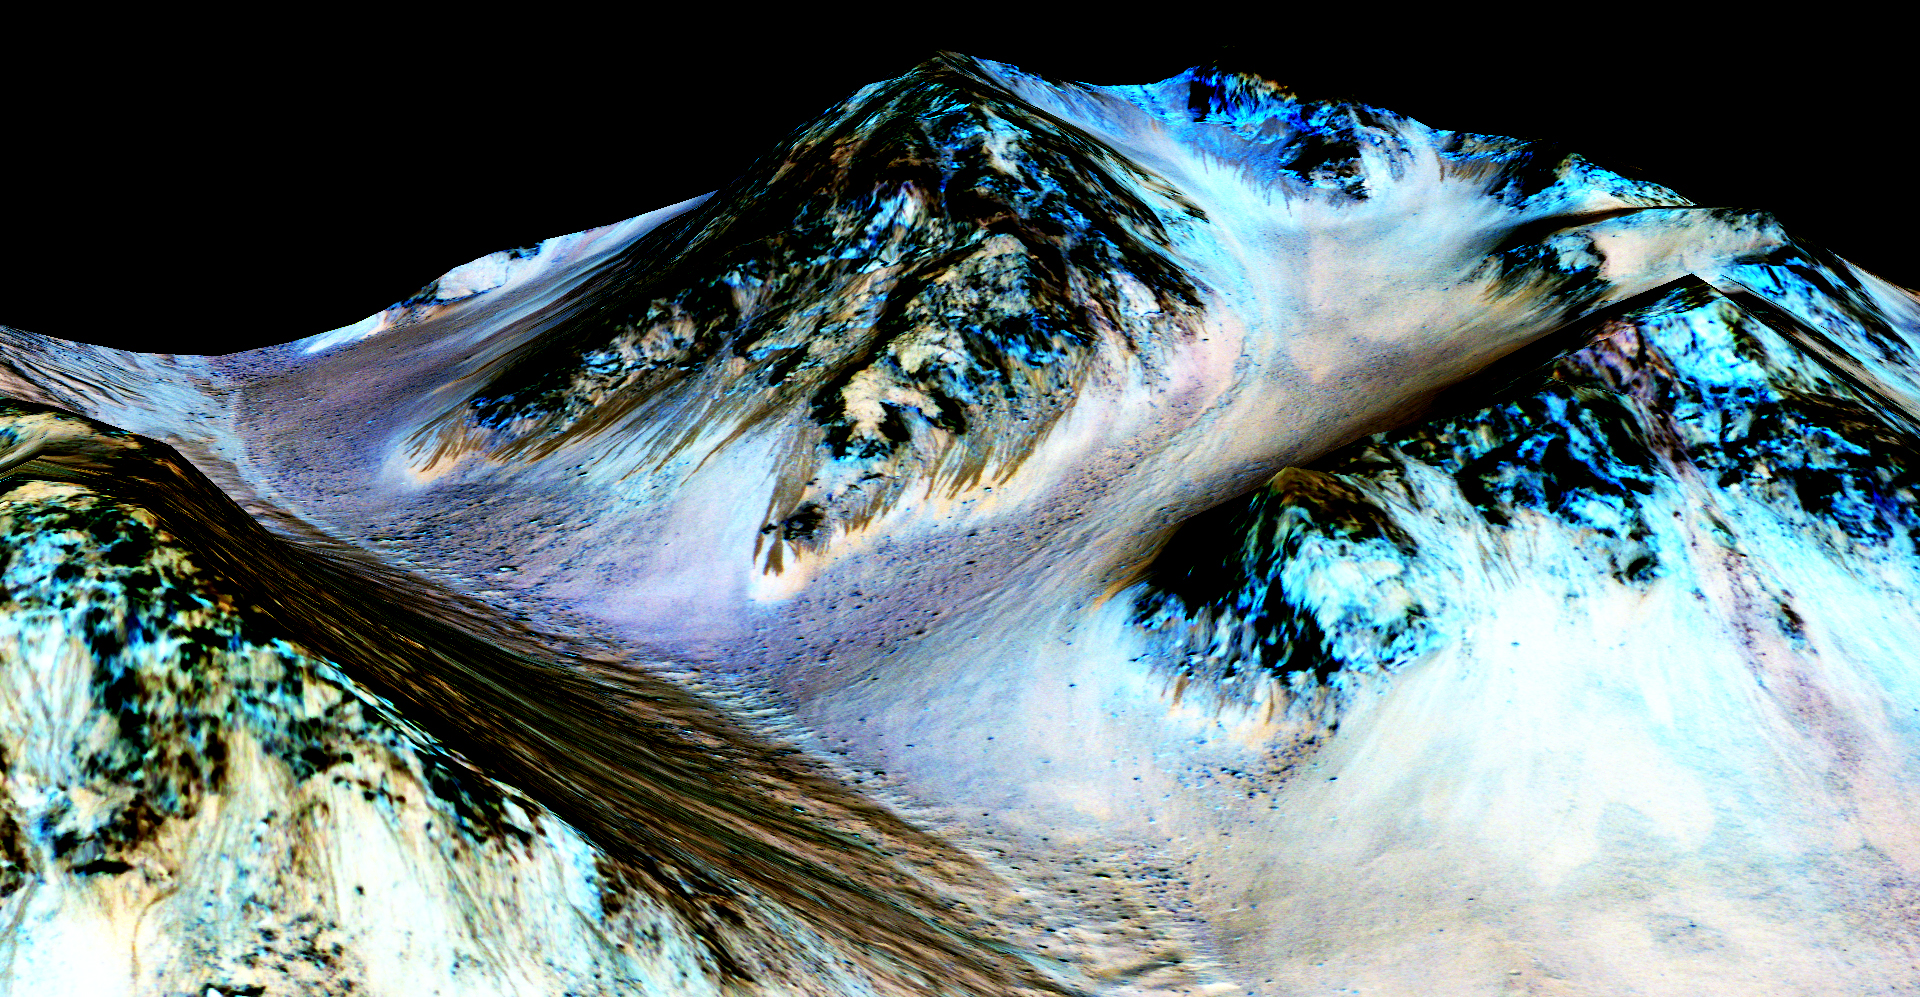 Credit NASA/JPL-Caltech/Univ. of Arizona